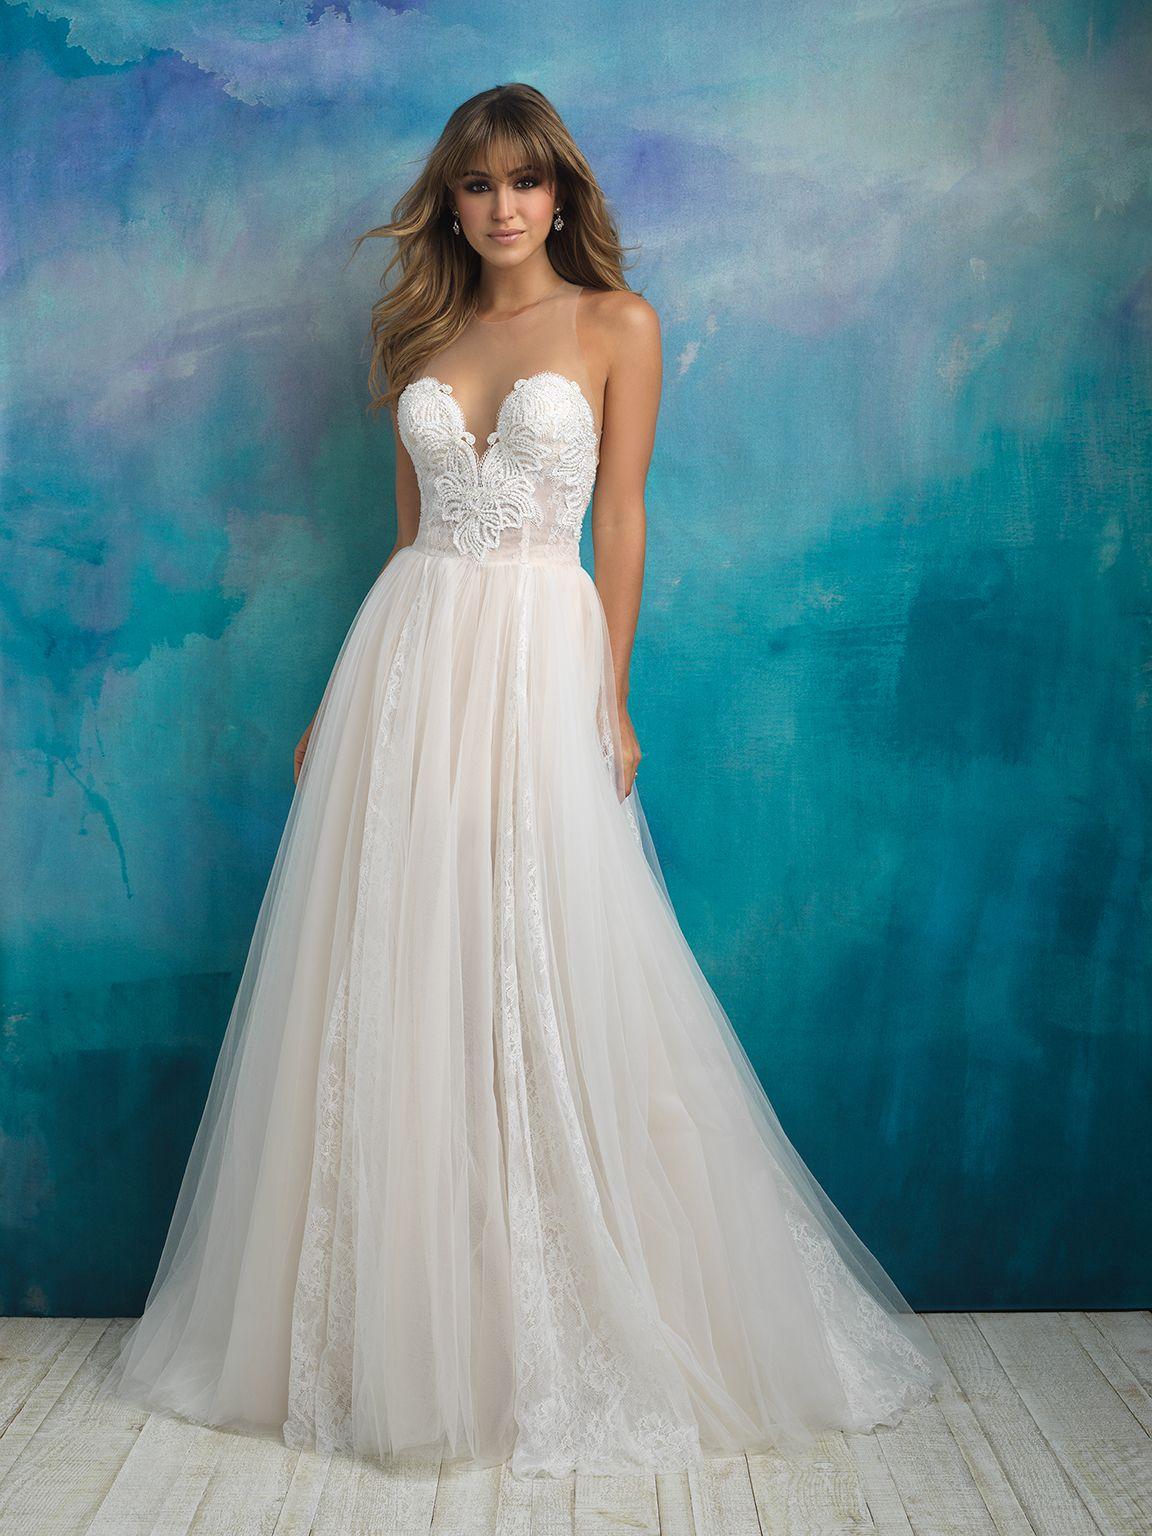 dfc3129535b1 Home | Exquisite Details | Wedding dresses, Wedding, Bridal dresses